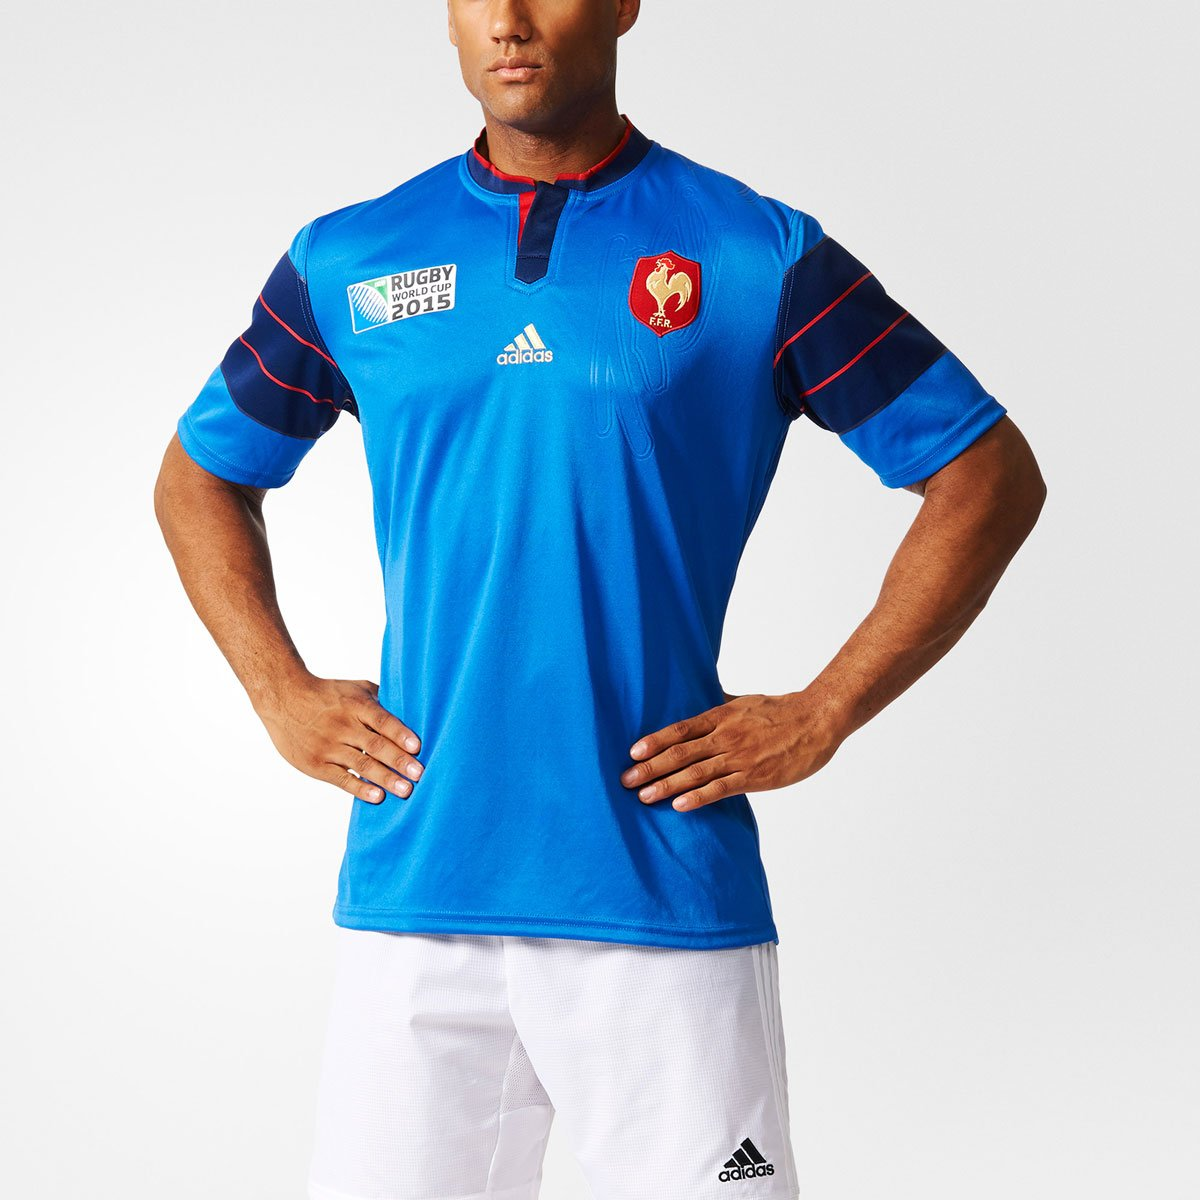 Adidas FFR RWC H JSY - Camiseta para Hombre, Color Azul/Azul Marino/Rojo, Talla S A95802